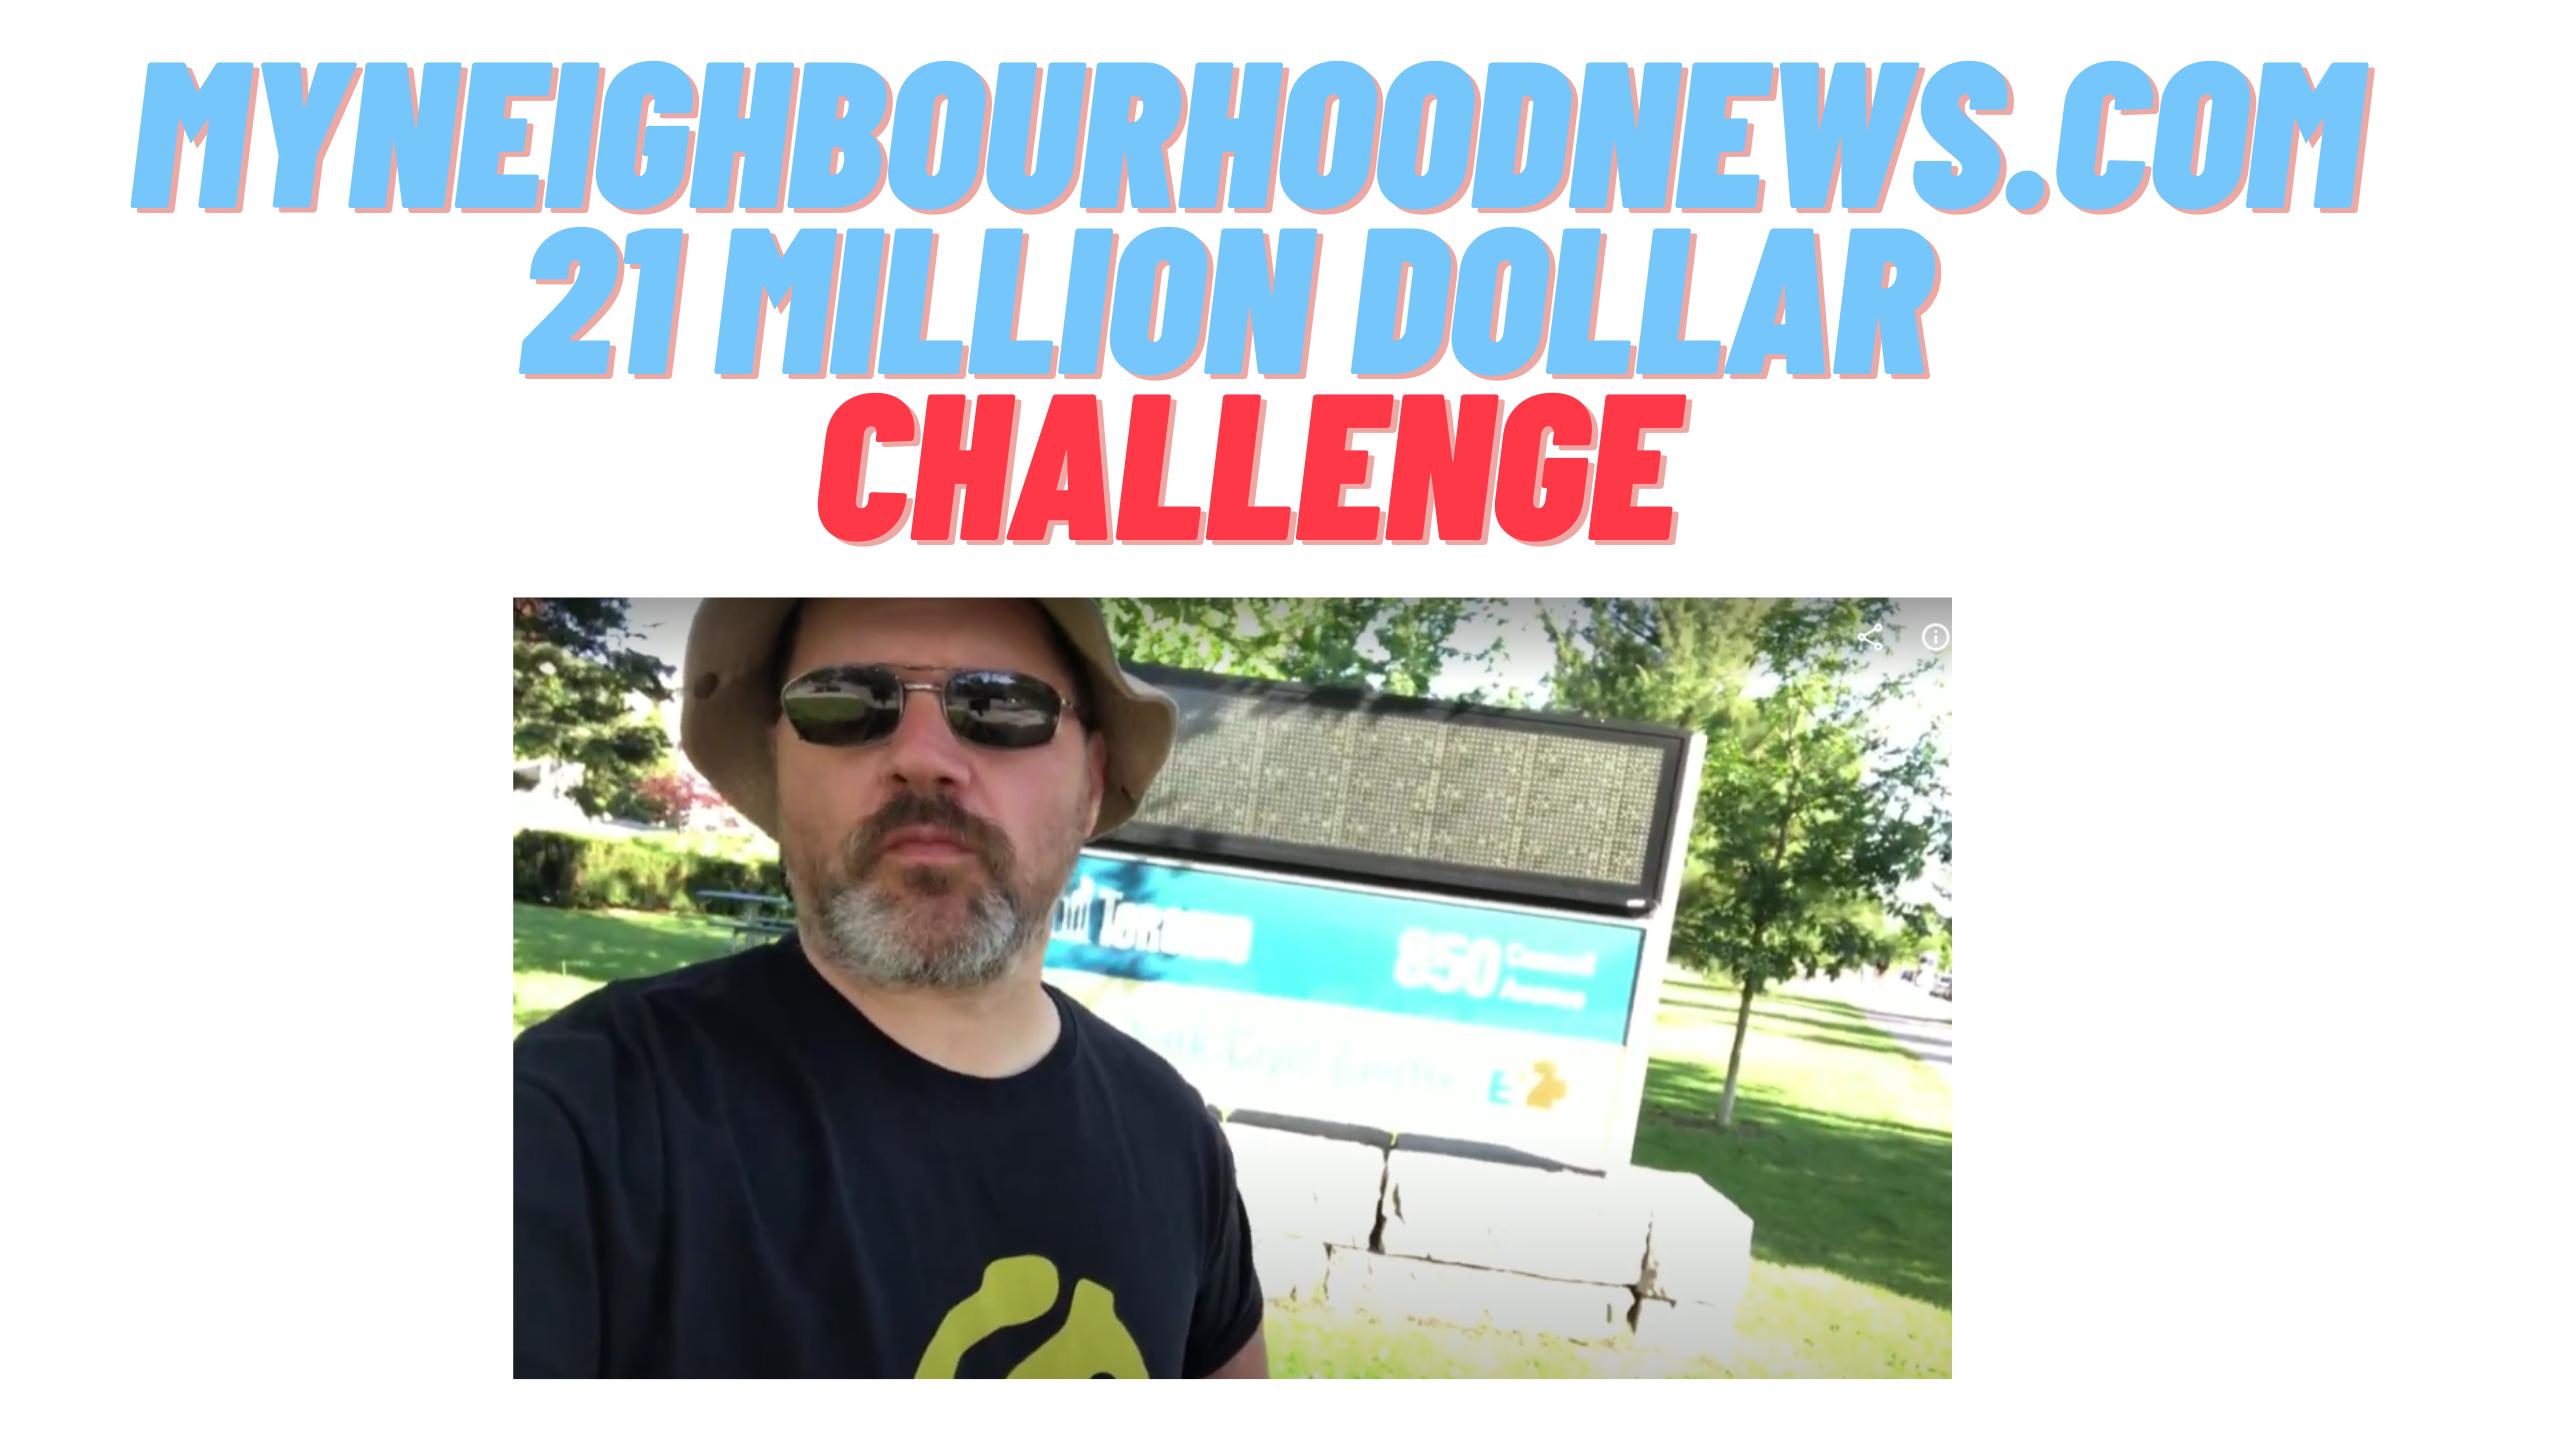 $21 Million Dollar Challenge